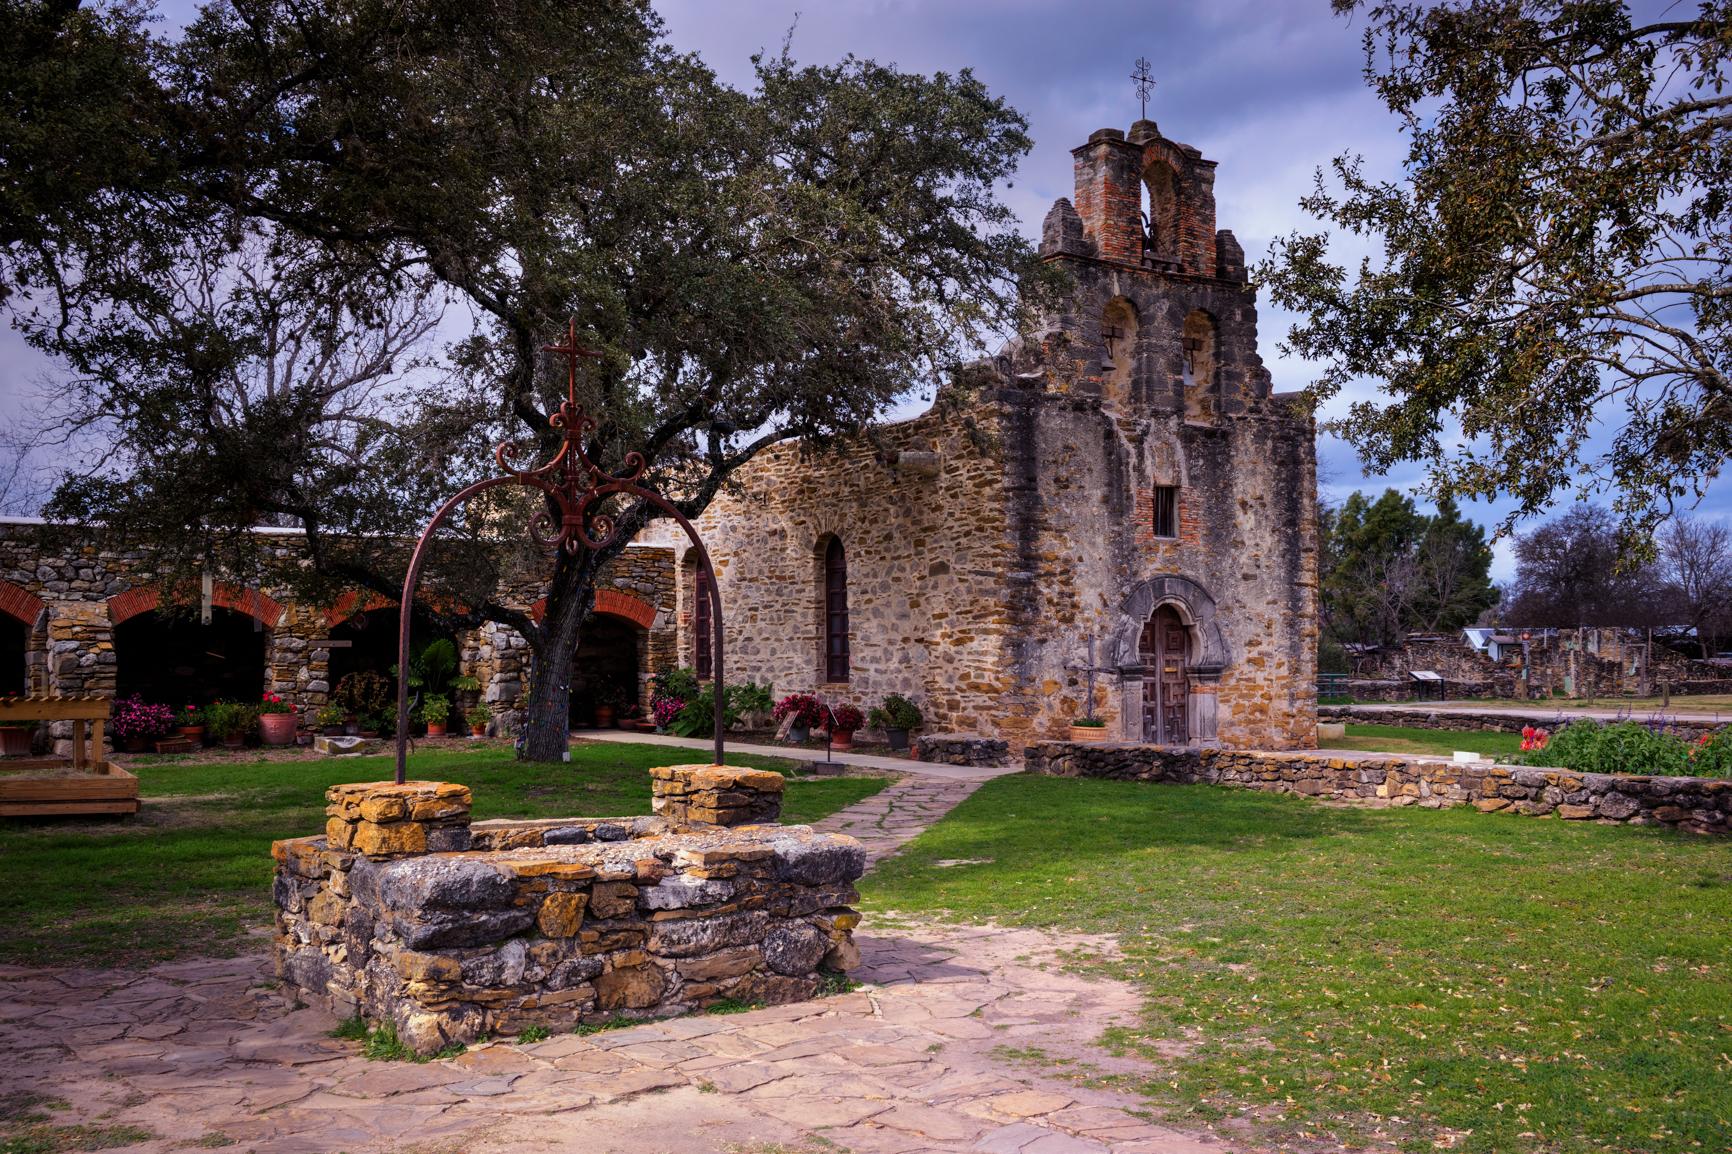 3 exposure HDR, f/11, tripod, ISO 100, 35mm -- San Antonio, TX (Mission Espada)